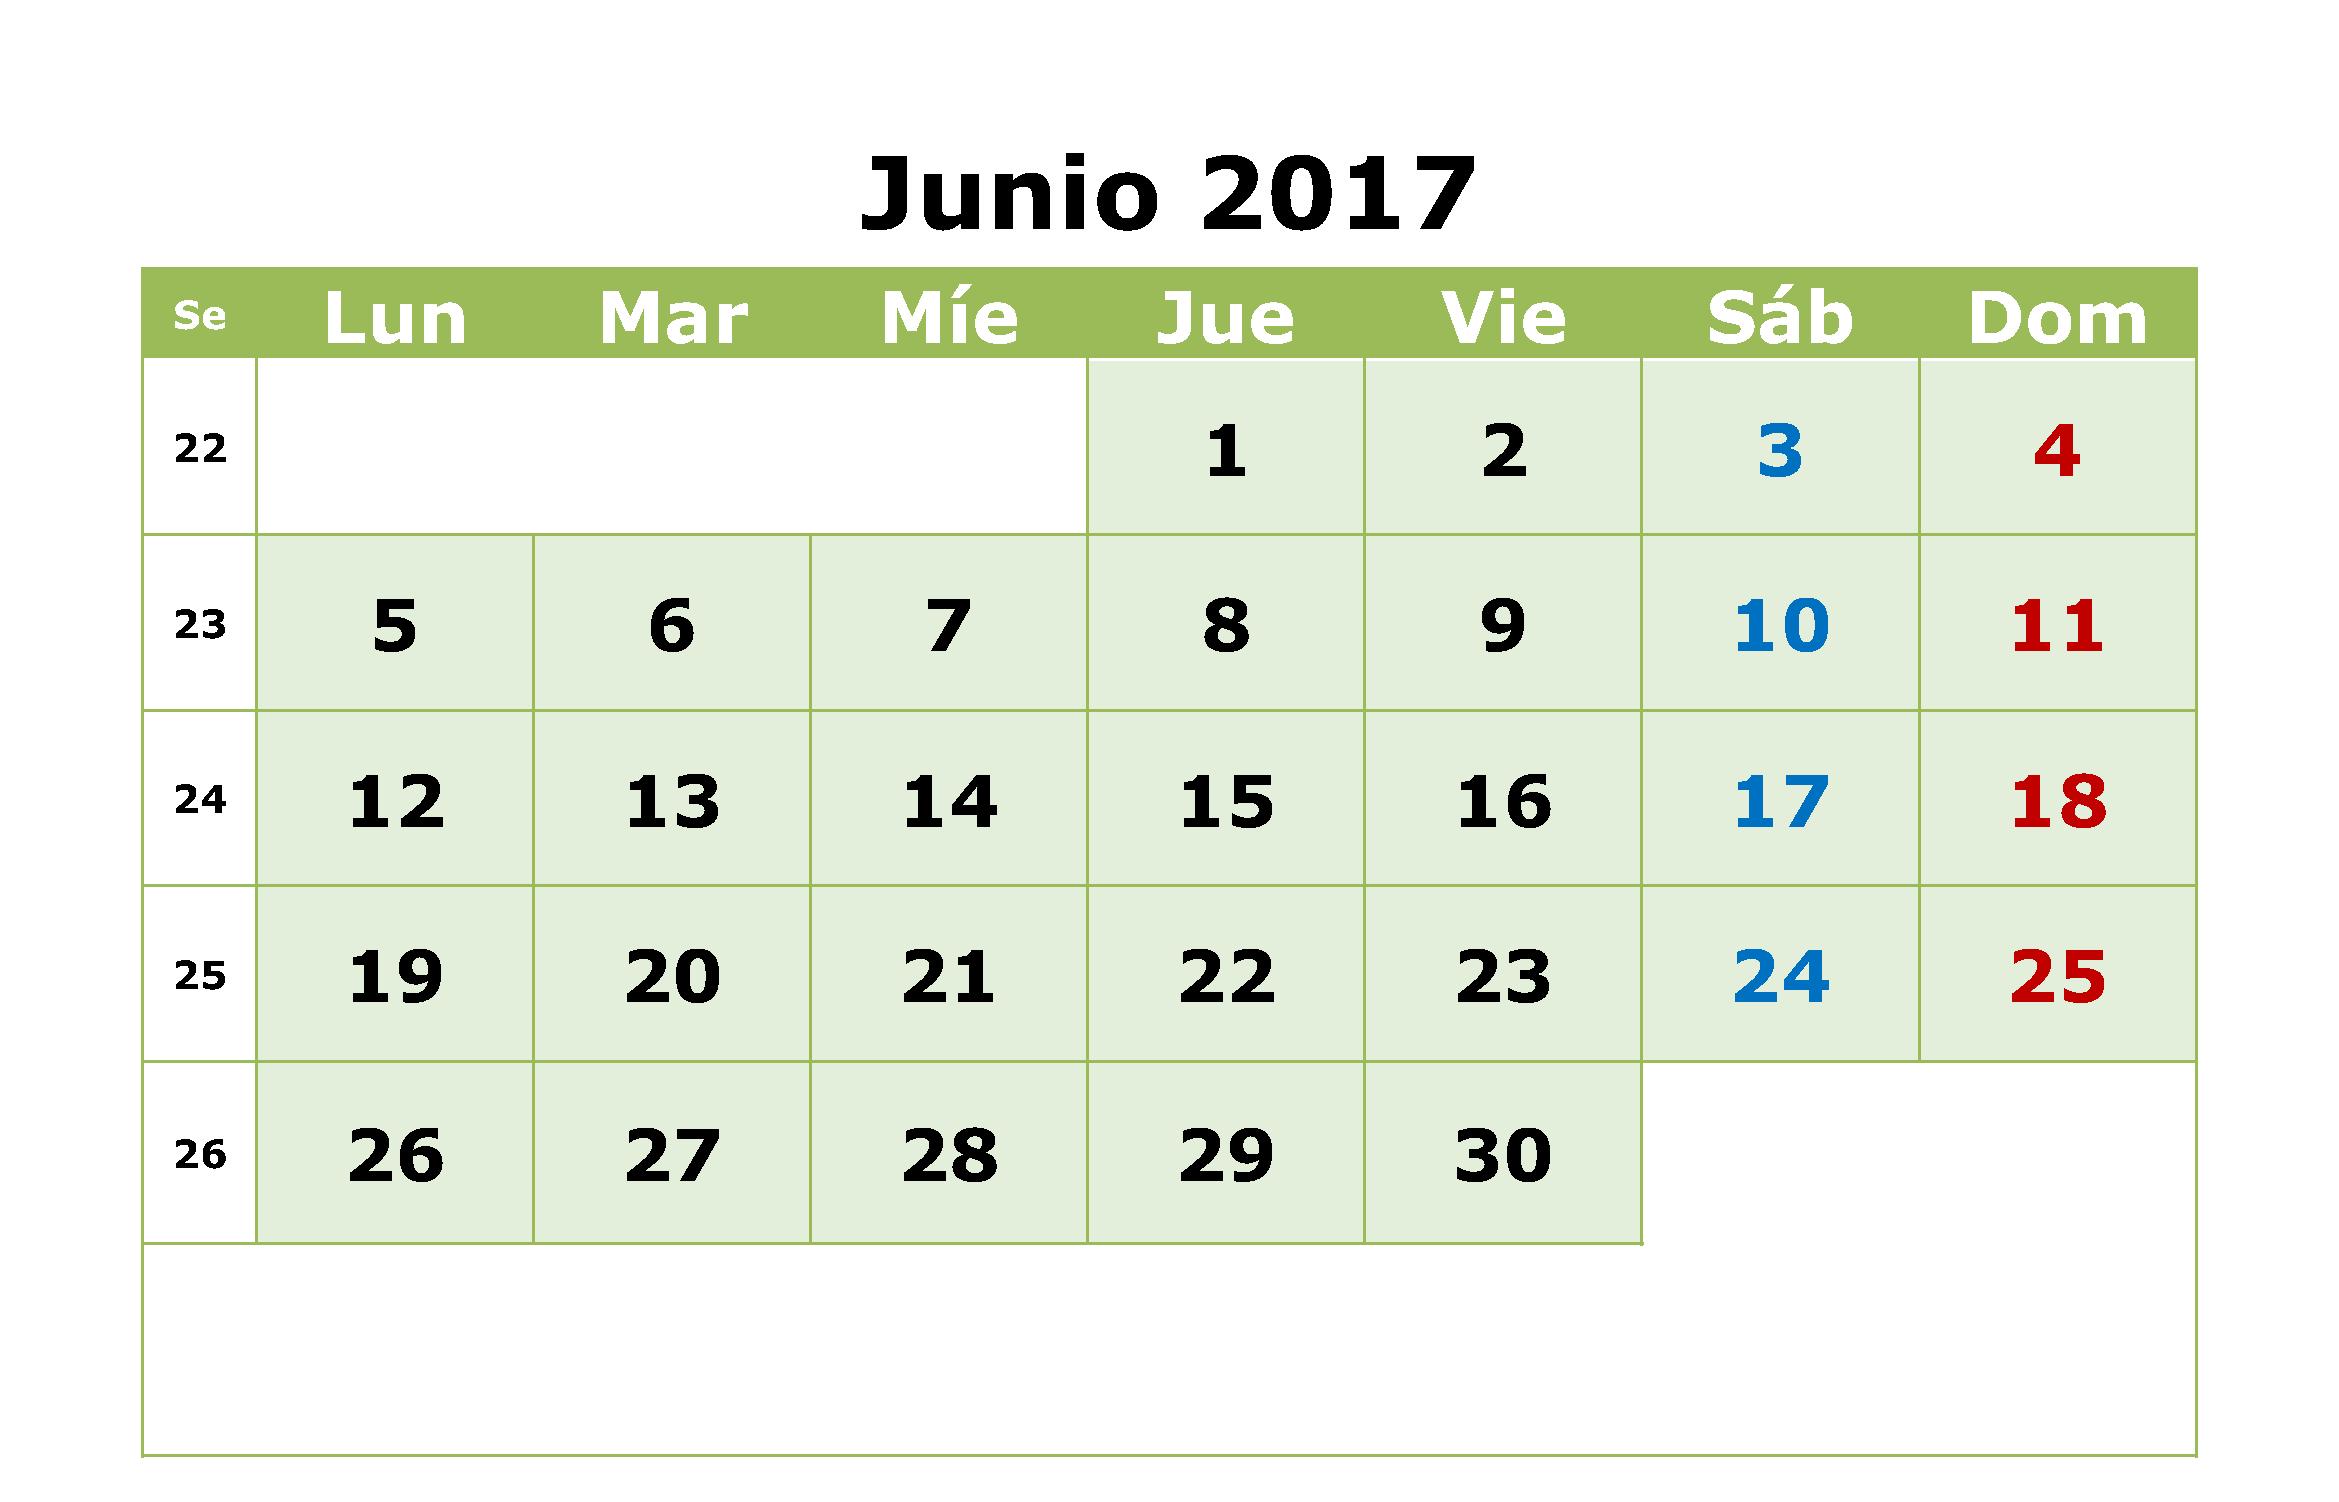 June 2017 Spanish Calendar Image